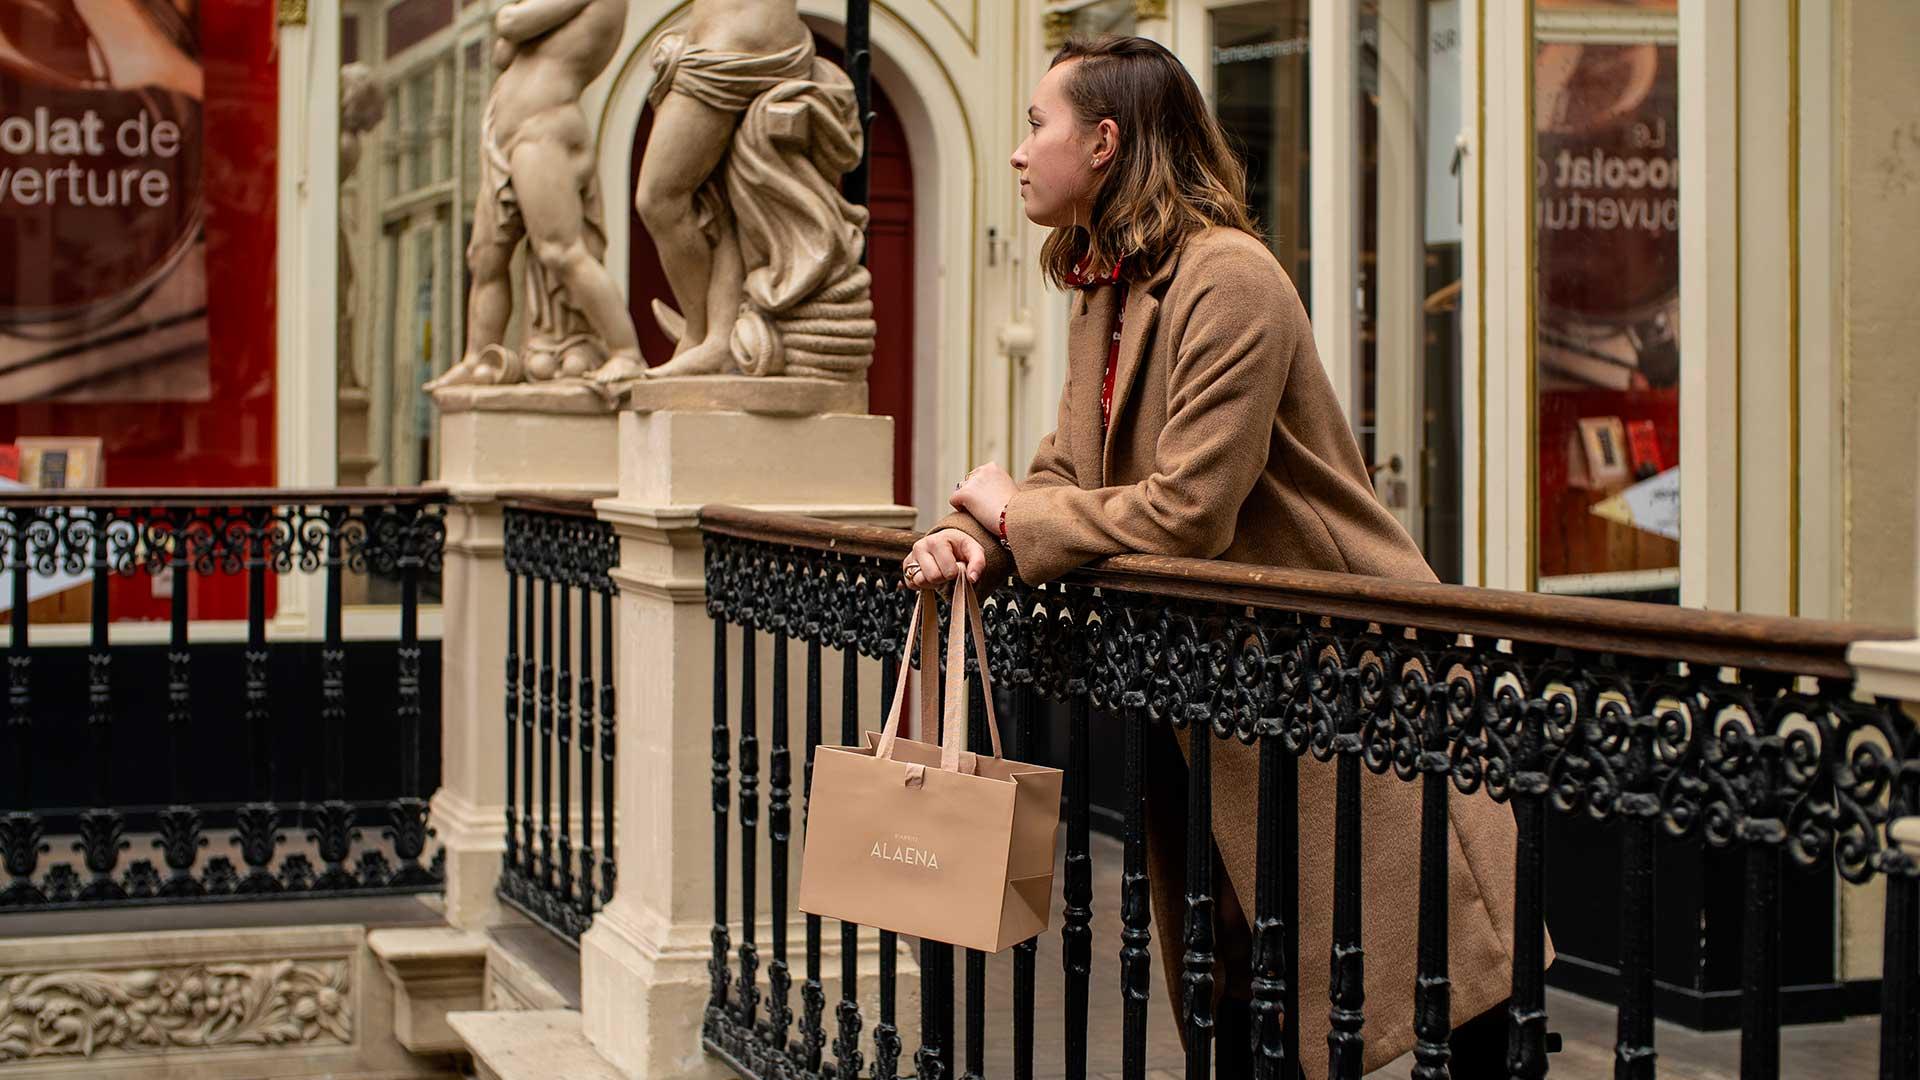 Pack-e bolsa de lujo